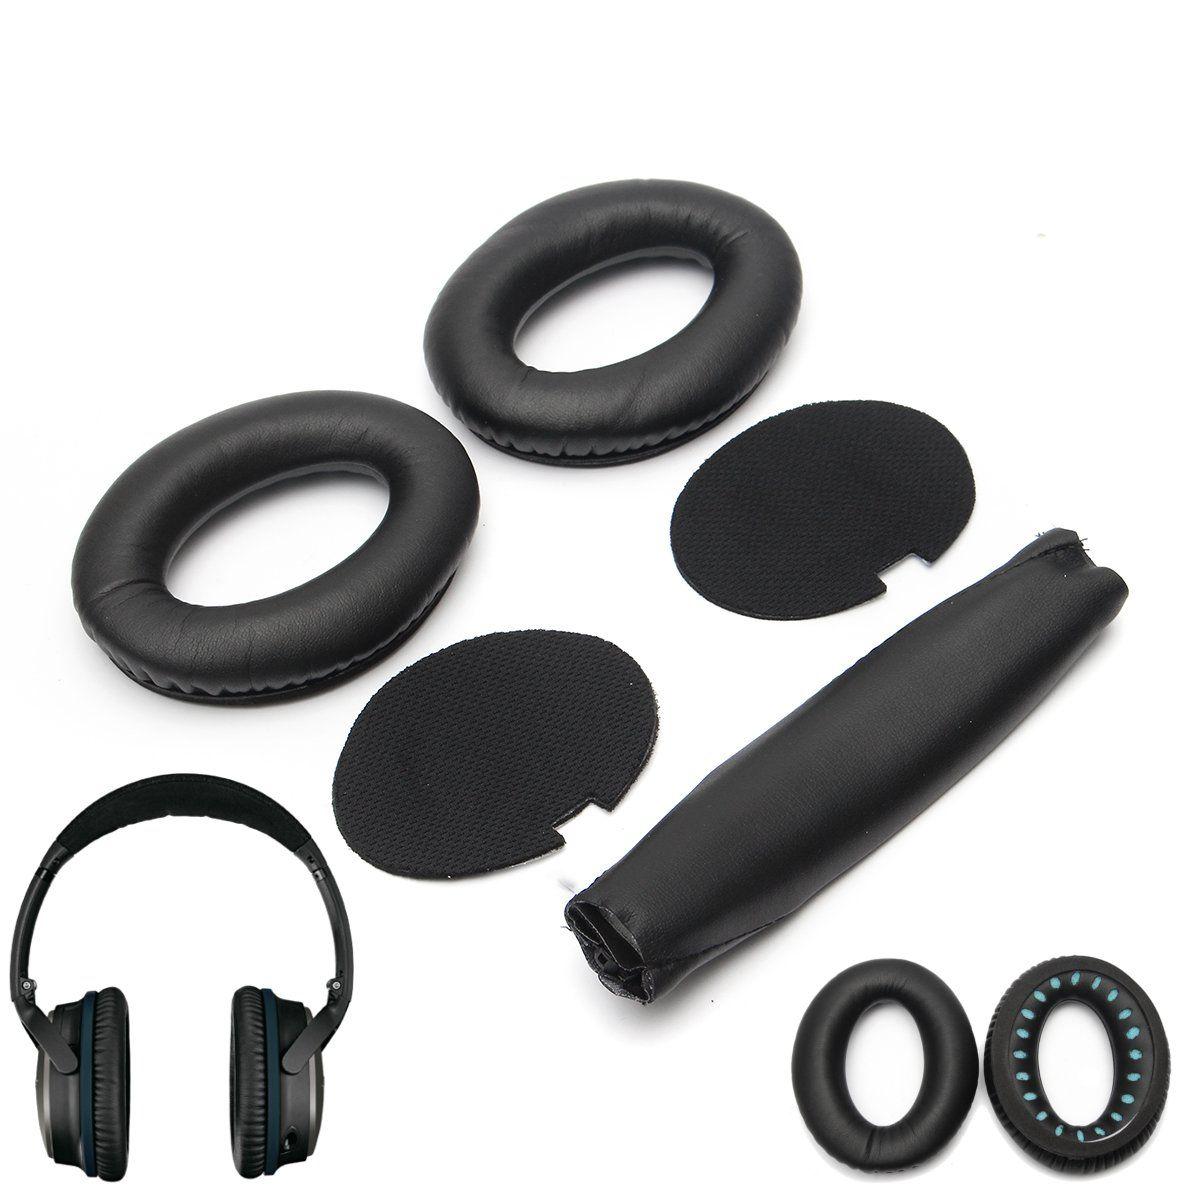 Replacement Ear Pads Headband Cushion for Bose QuietComfort QC15 QC2 Headphones